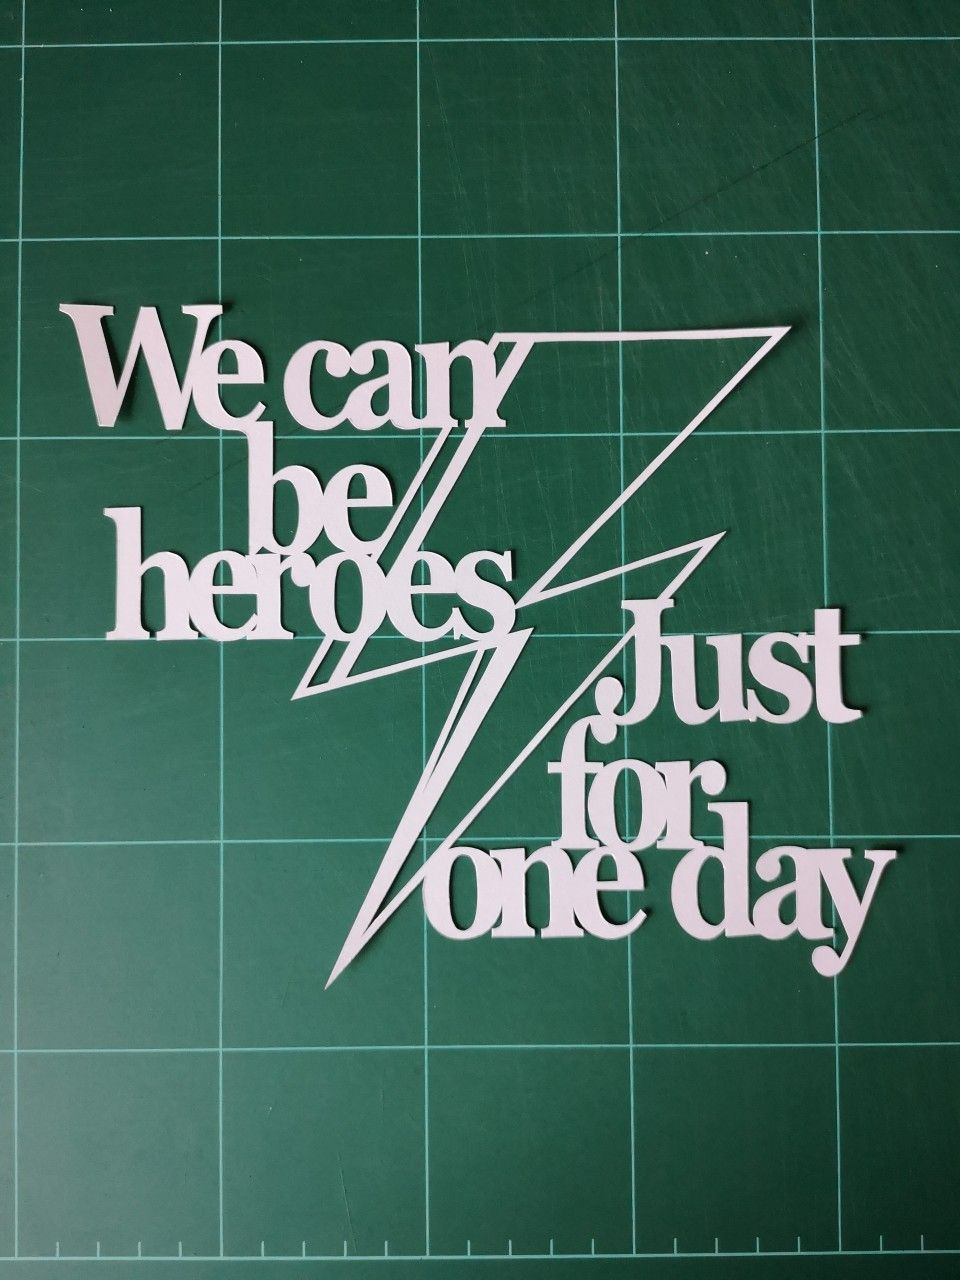 Bowie Lyrics